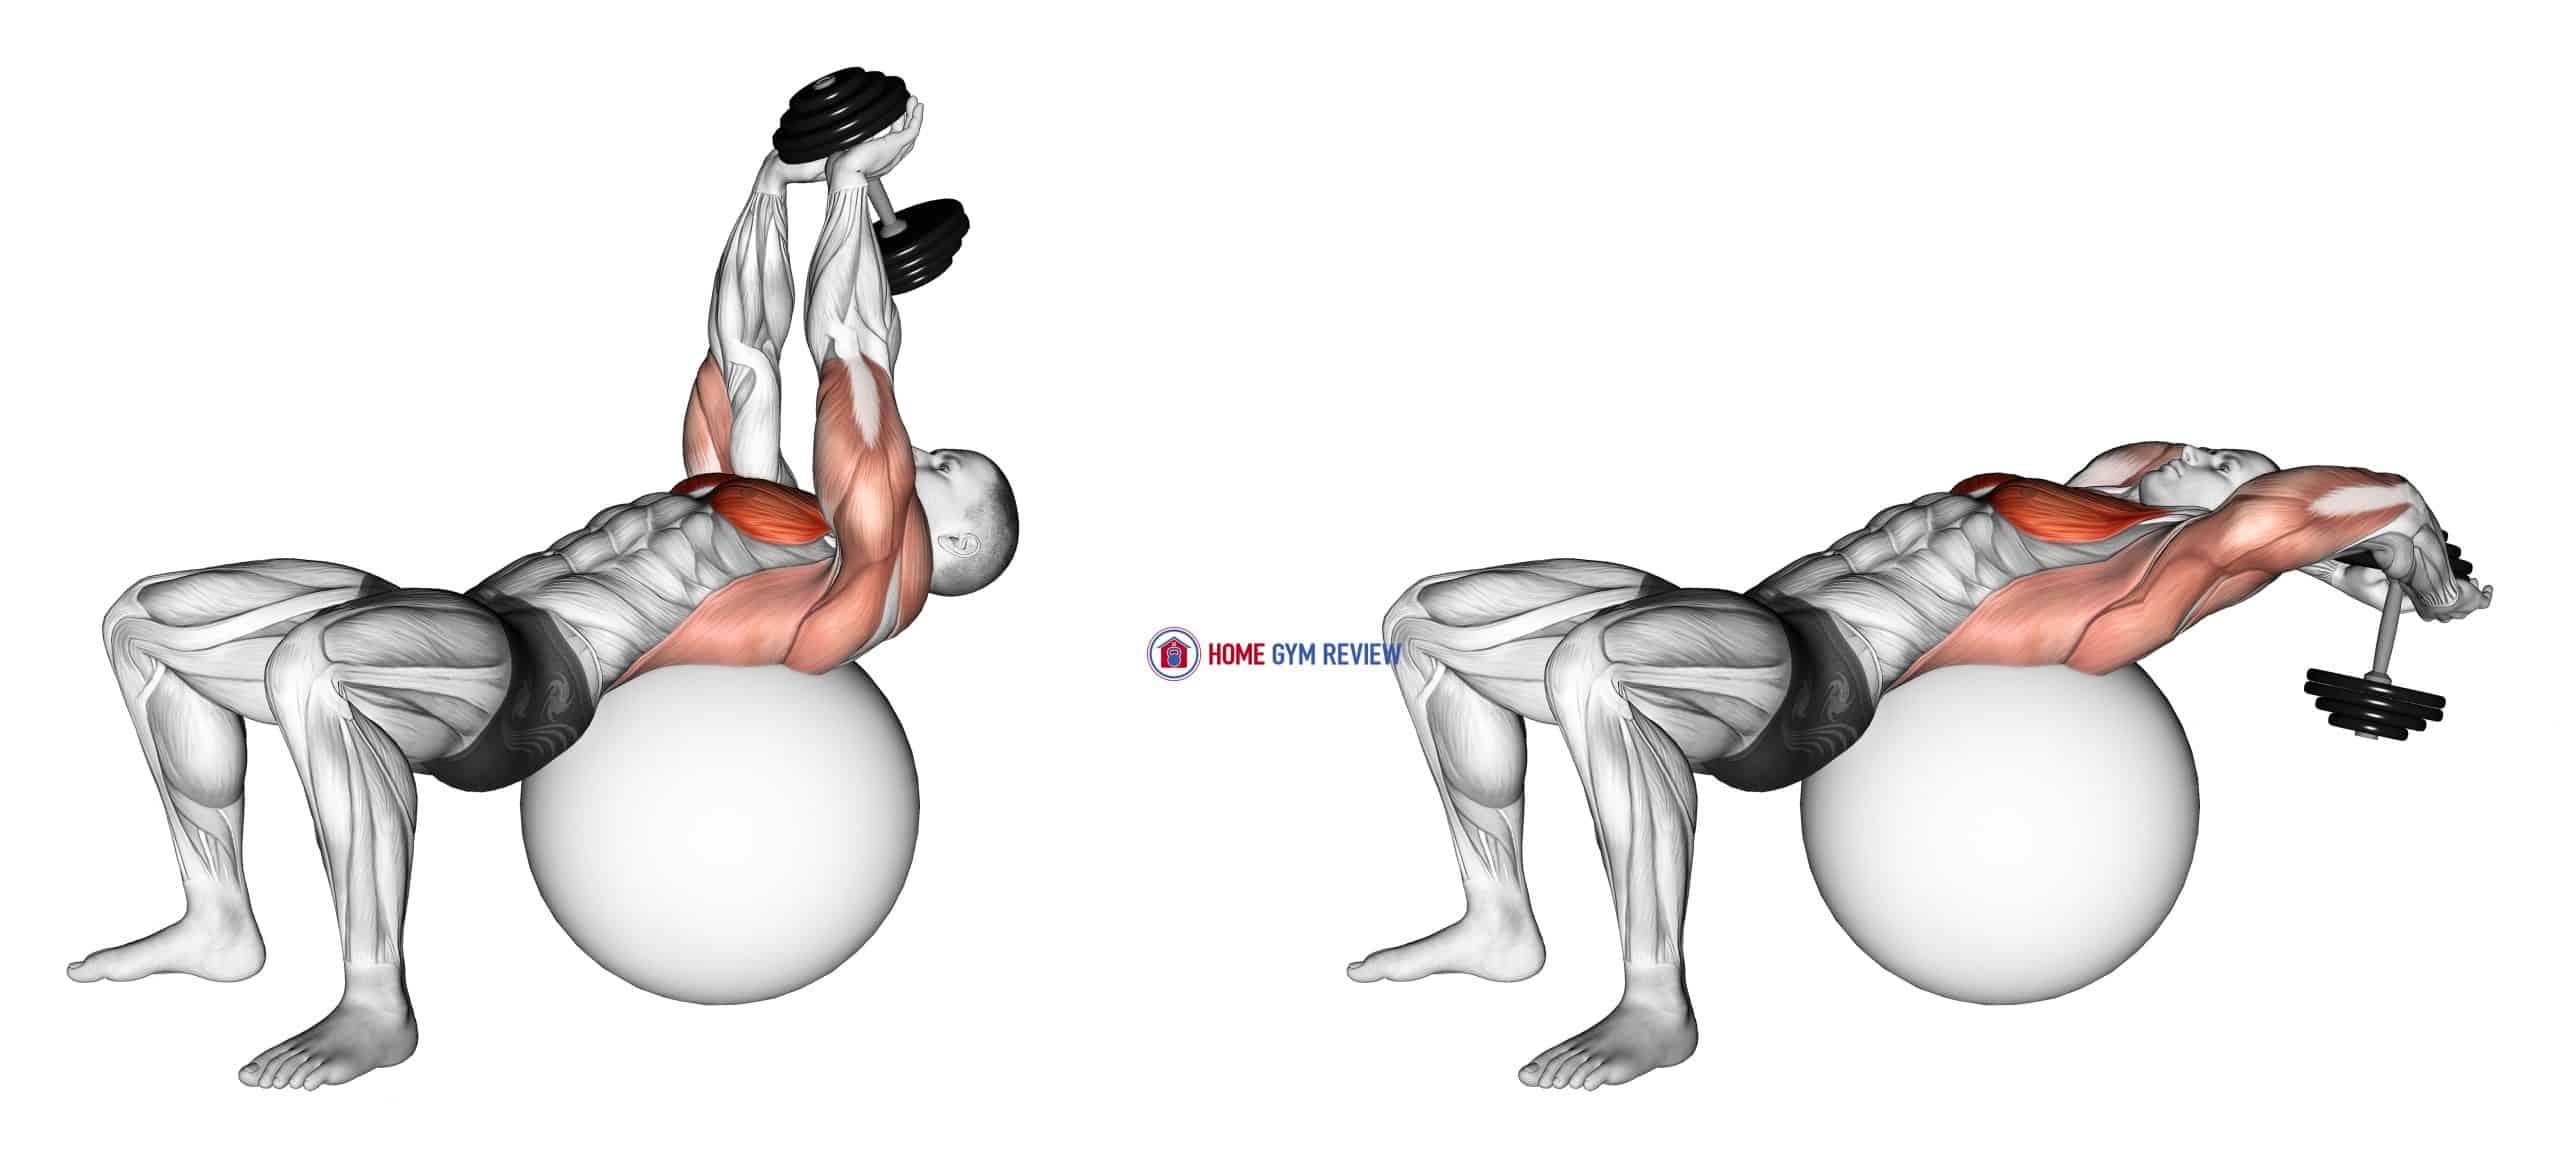 Dumbbell Pullover on Exercise Ball